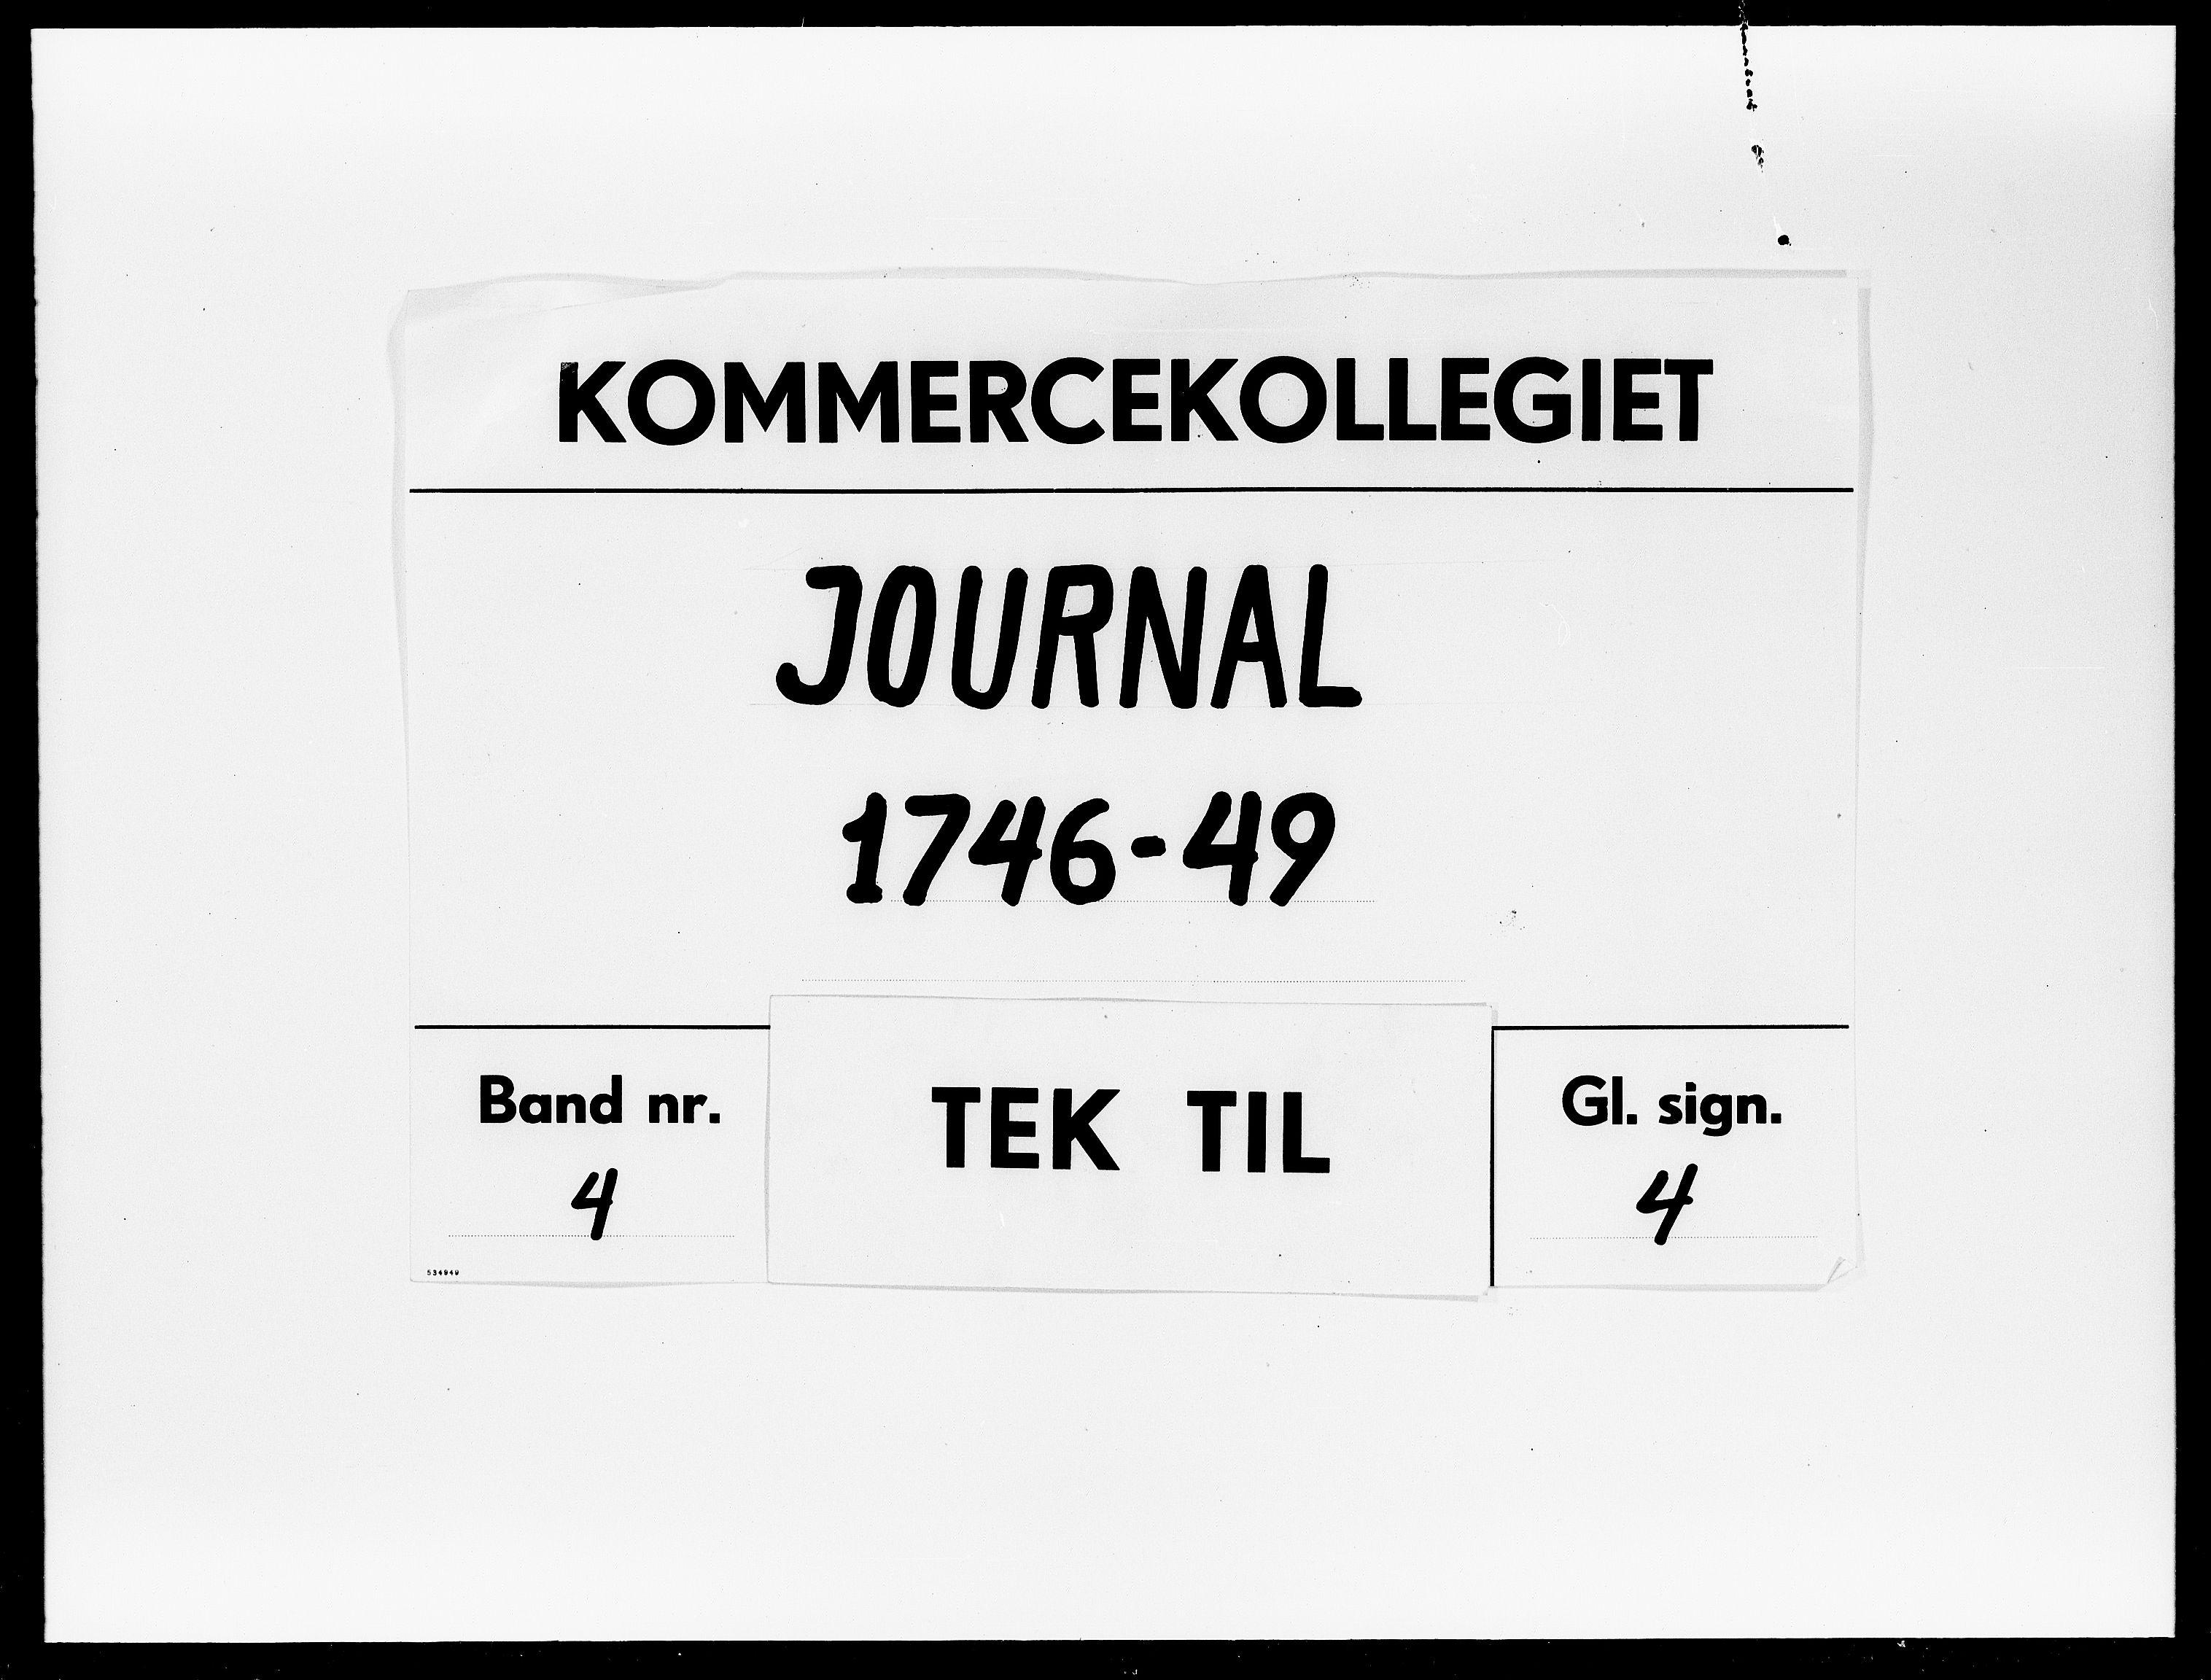 DRA, Kommercekollegiet, Dansk-Norske Sekretariat, -/52: Journal nr. 4, 1746-1749